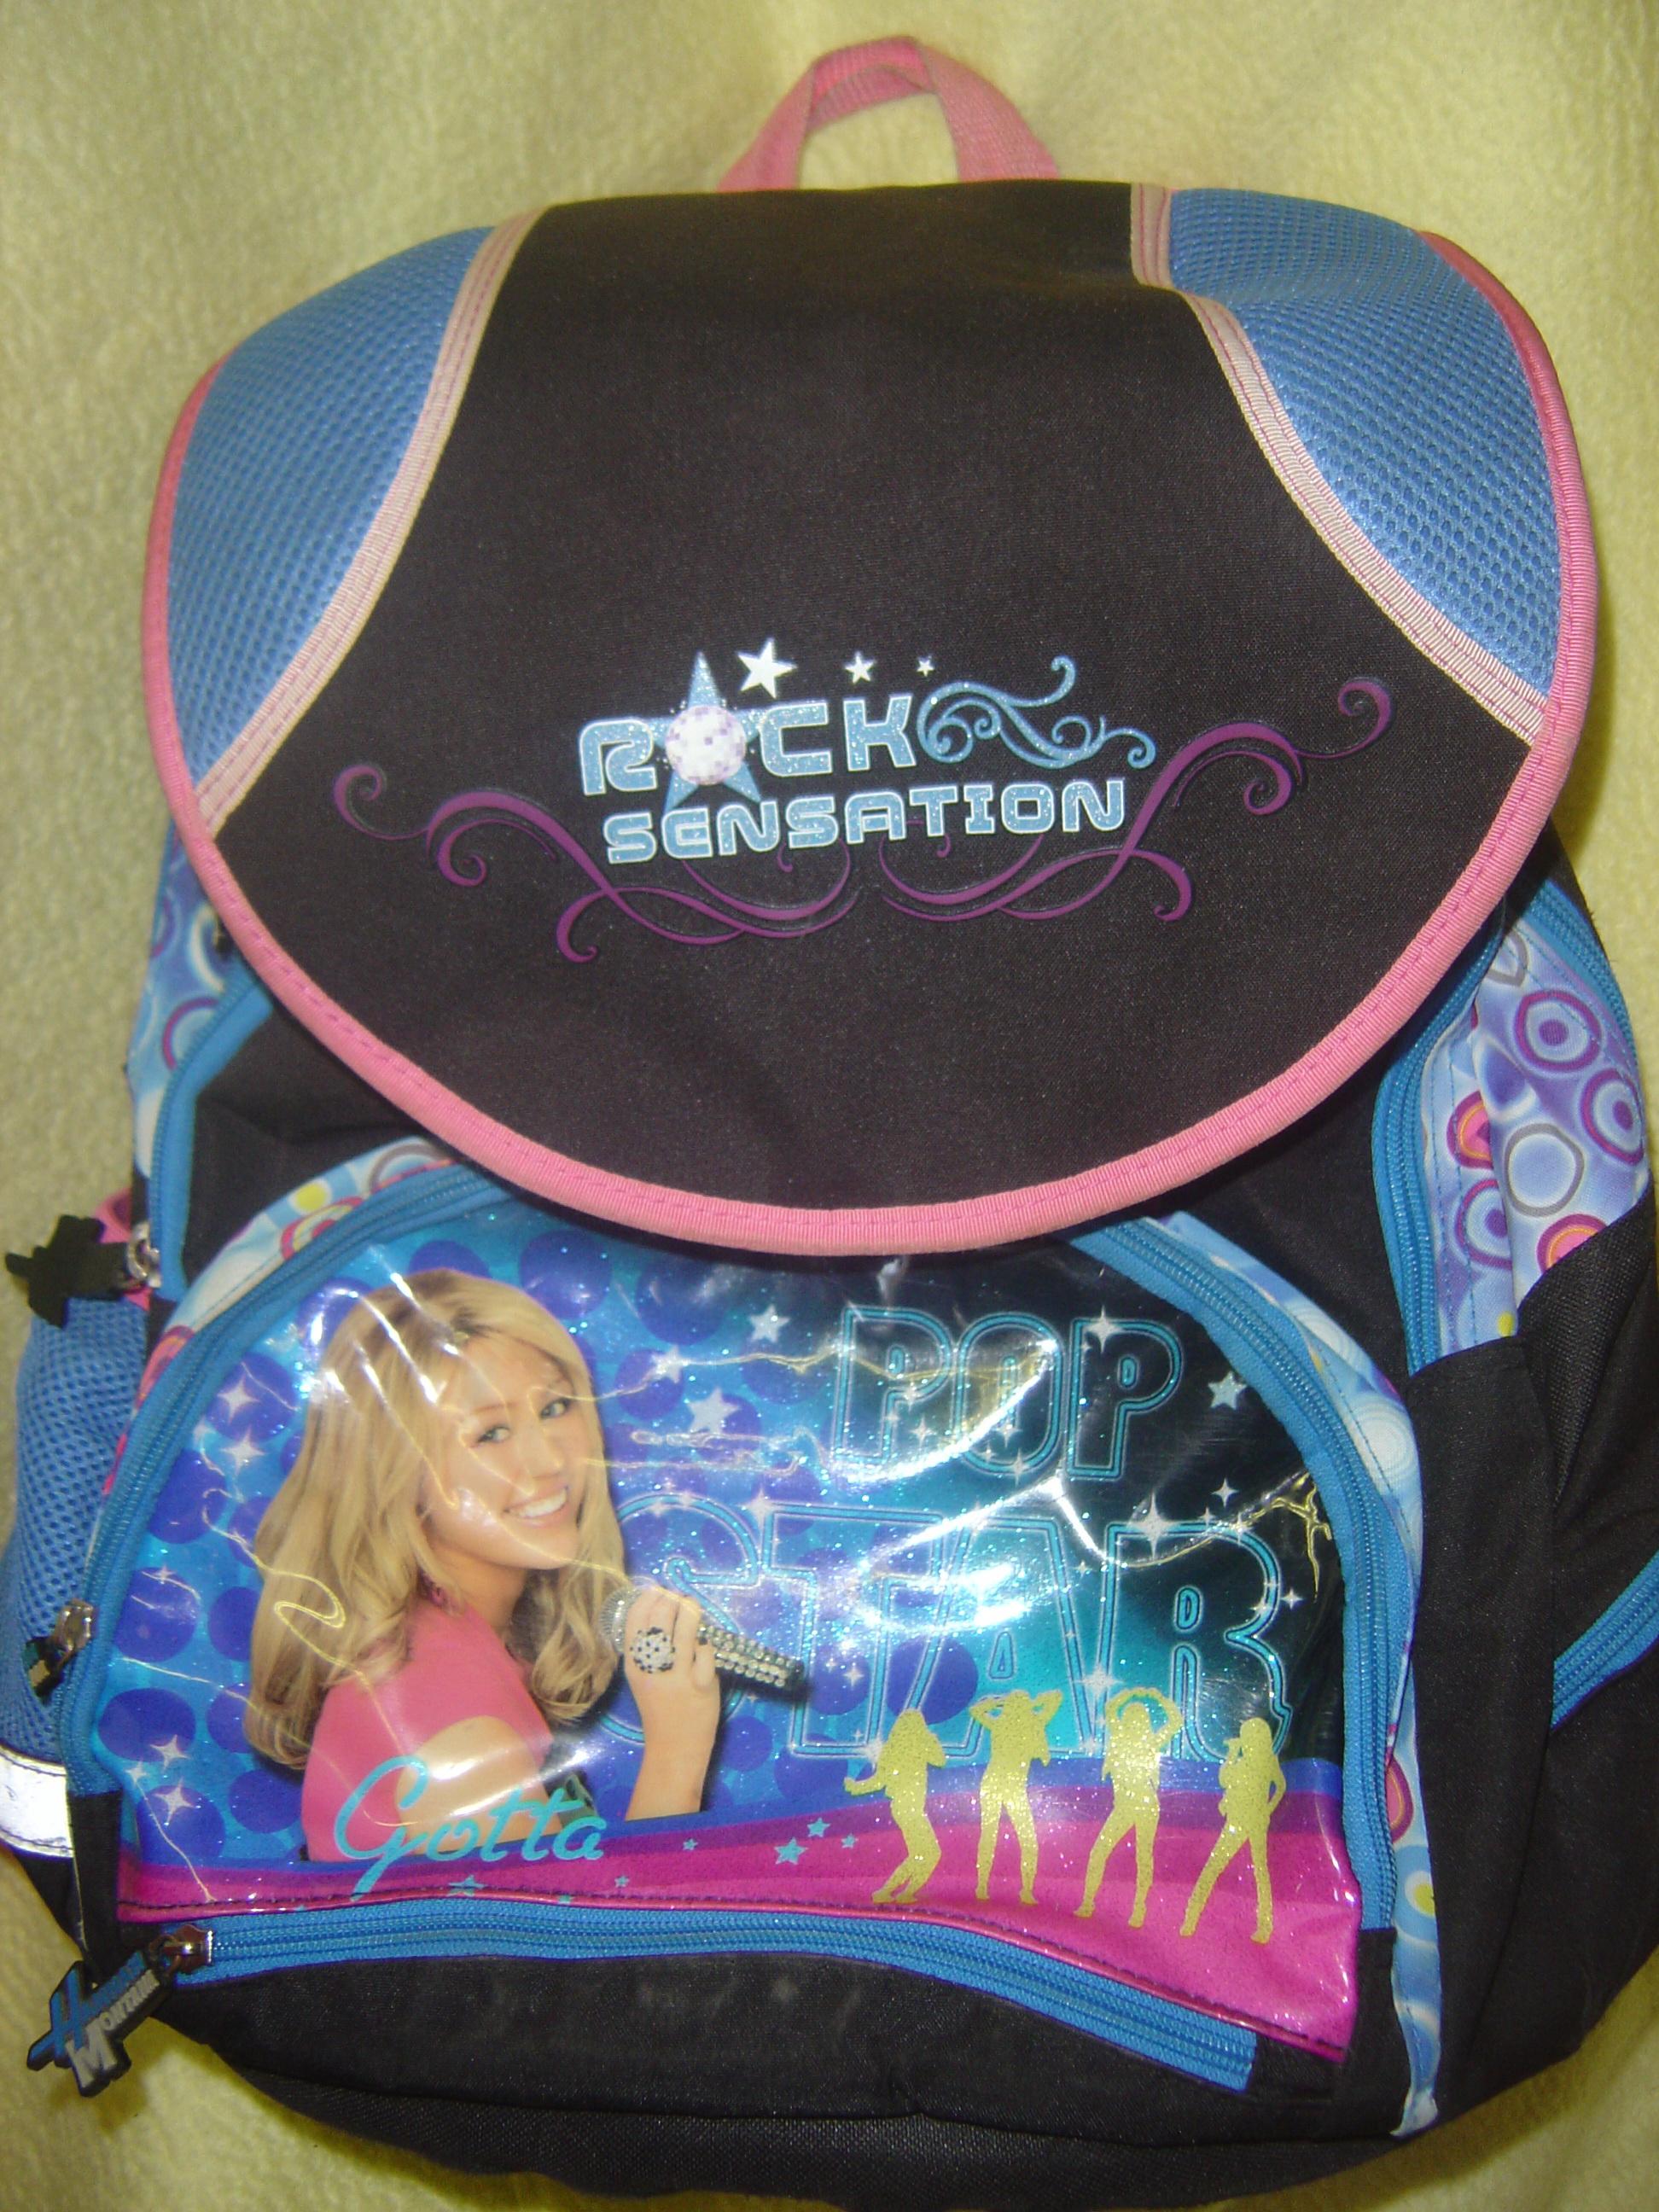 Školní ergonomický batoh Hannah Montana  cc0e075414